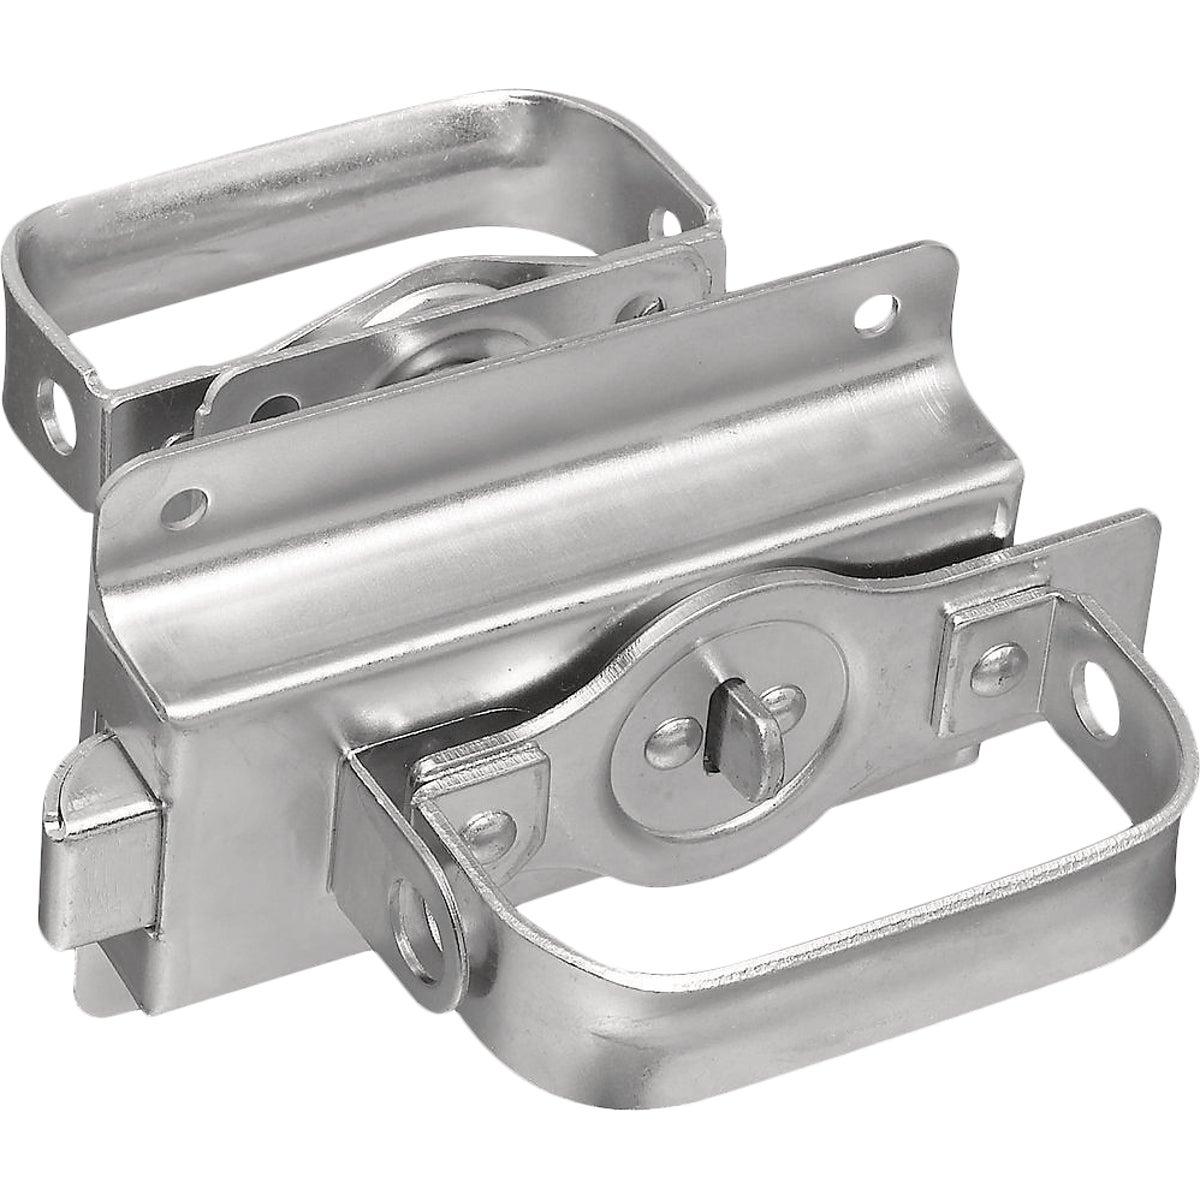 ZINC SWINGING DOOR LATCH - N101600 by National Mfg Co